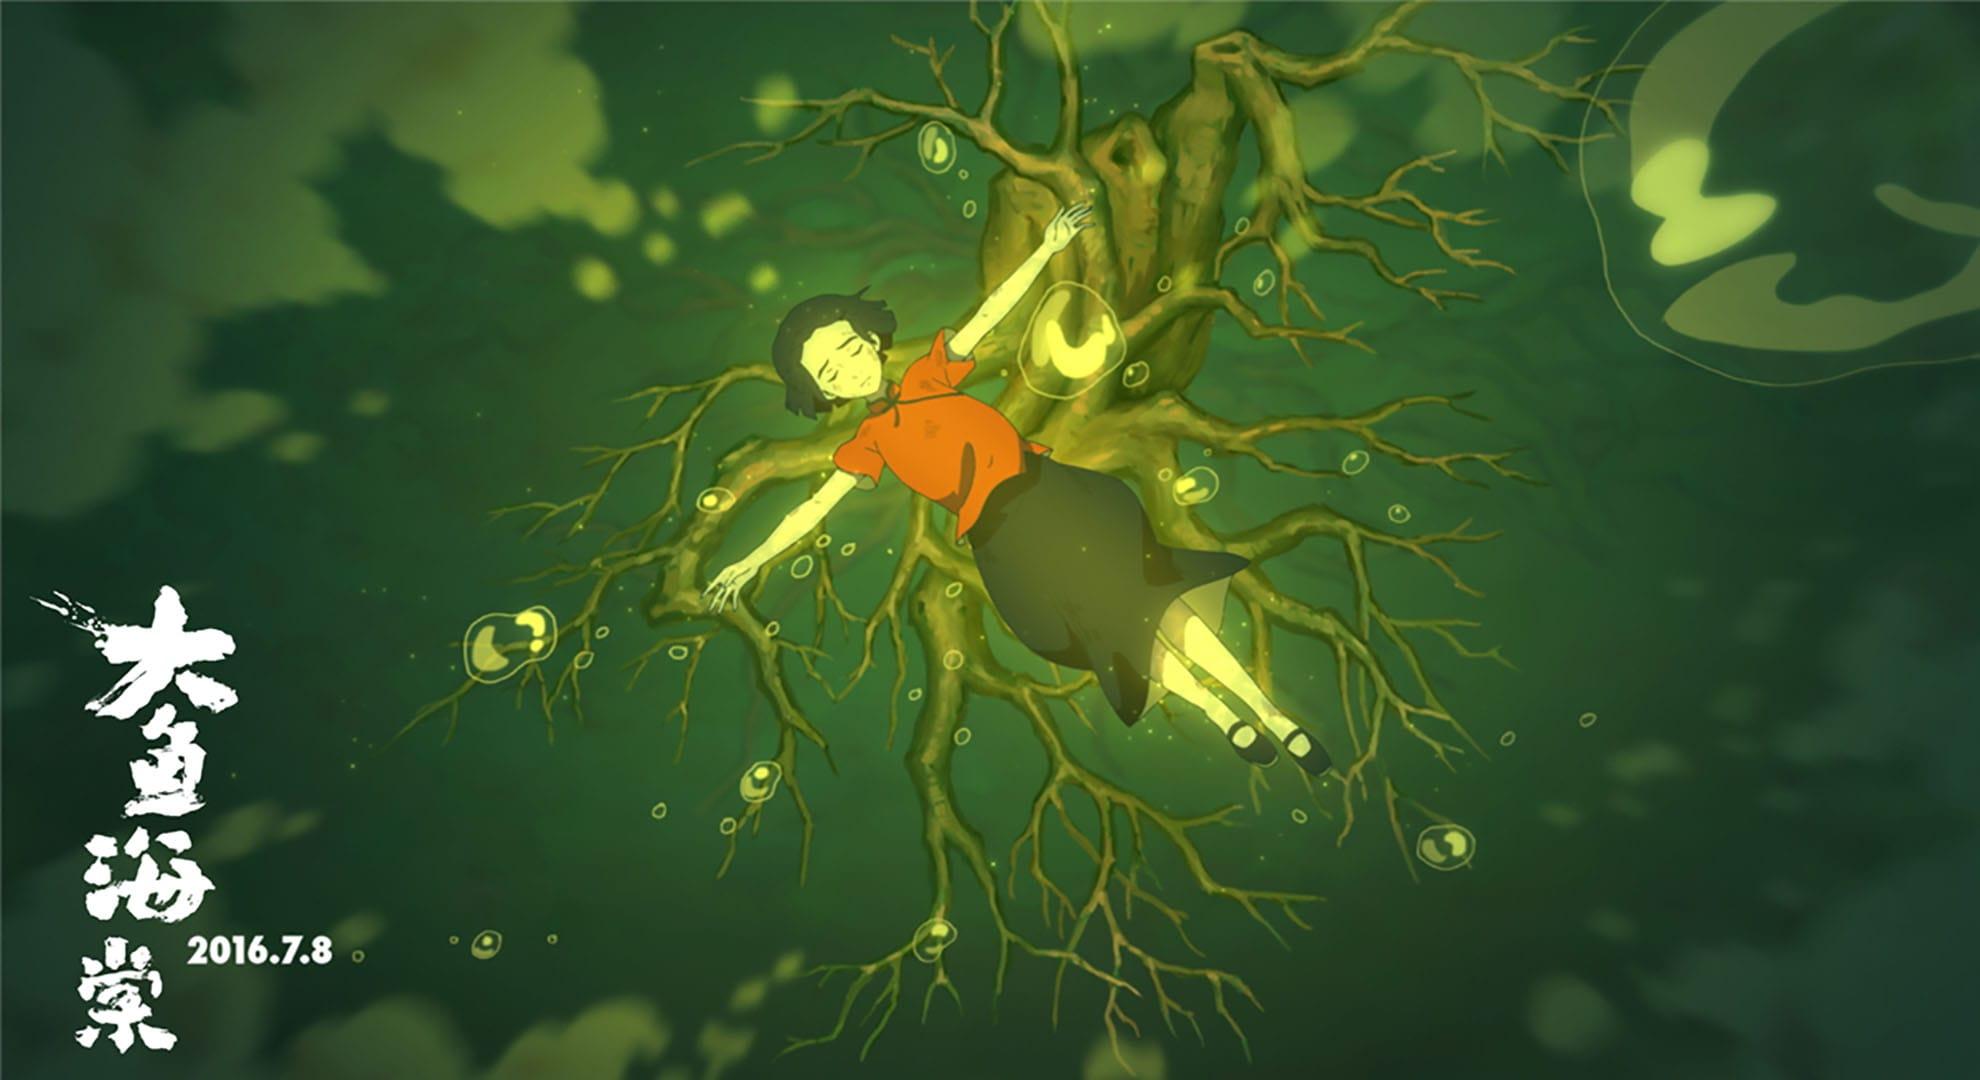 Festival international du film d'animation d'Annecy 2017 image Big Fish & Begonia